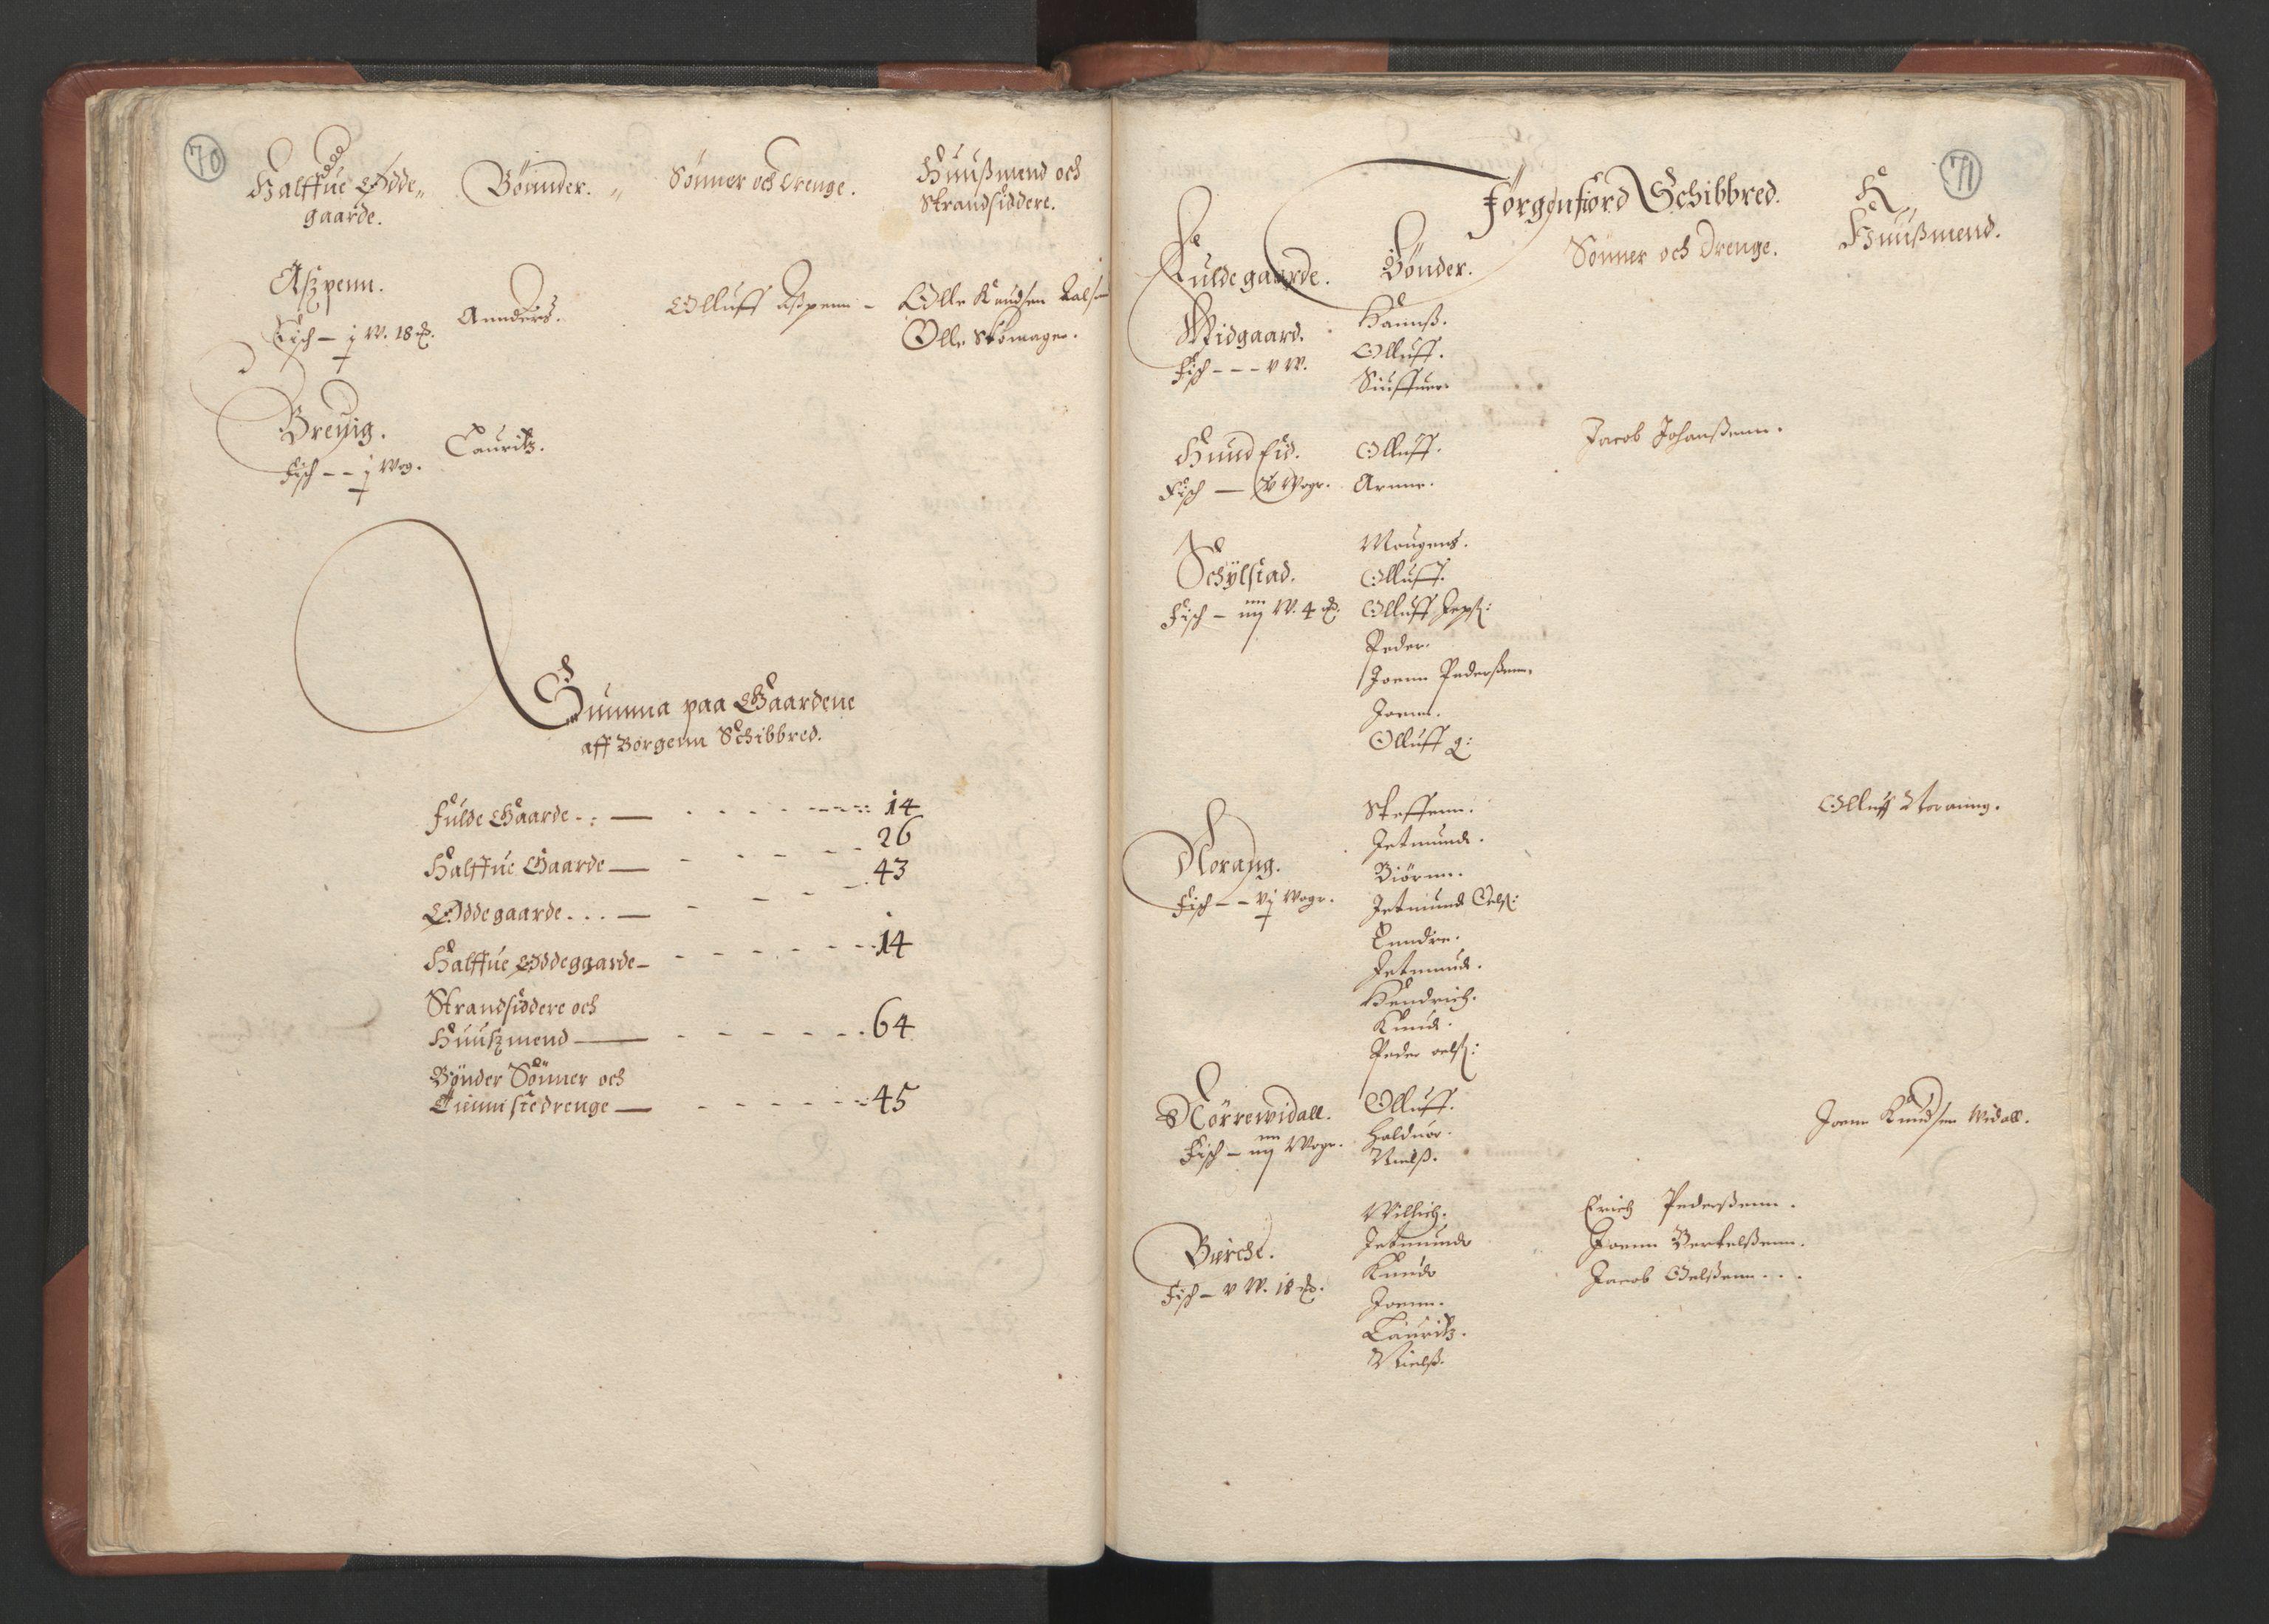 RA, Fogdenes og sorenskrivernes manntall 1664-1666, nr. 16: Romsdal fogderi og Sunnmøre fogderi, 1664-1665, s. 70-71